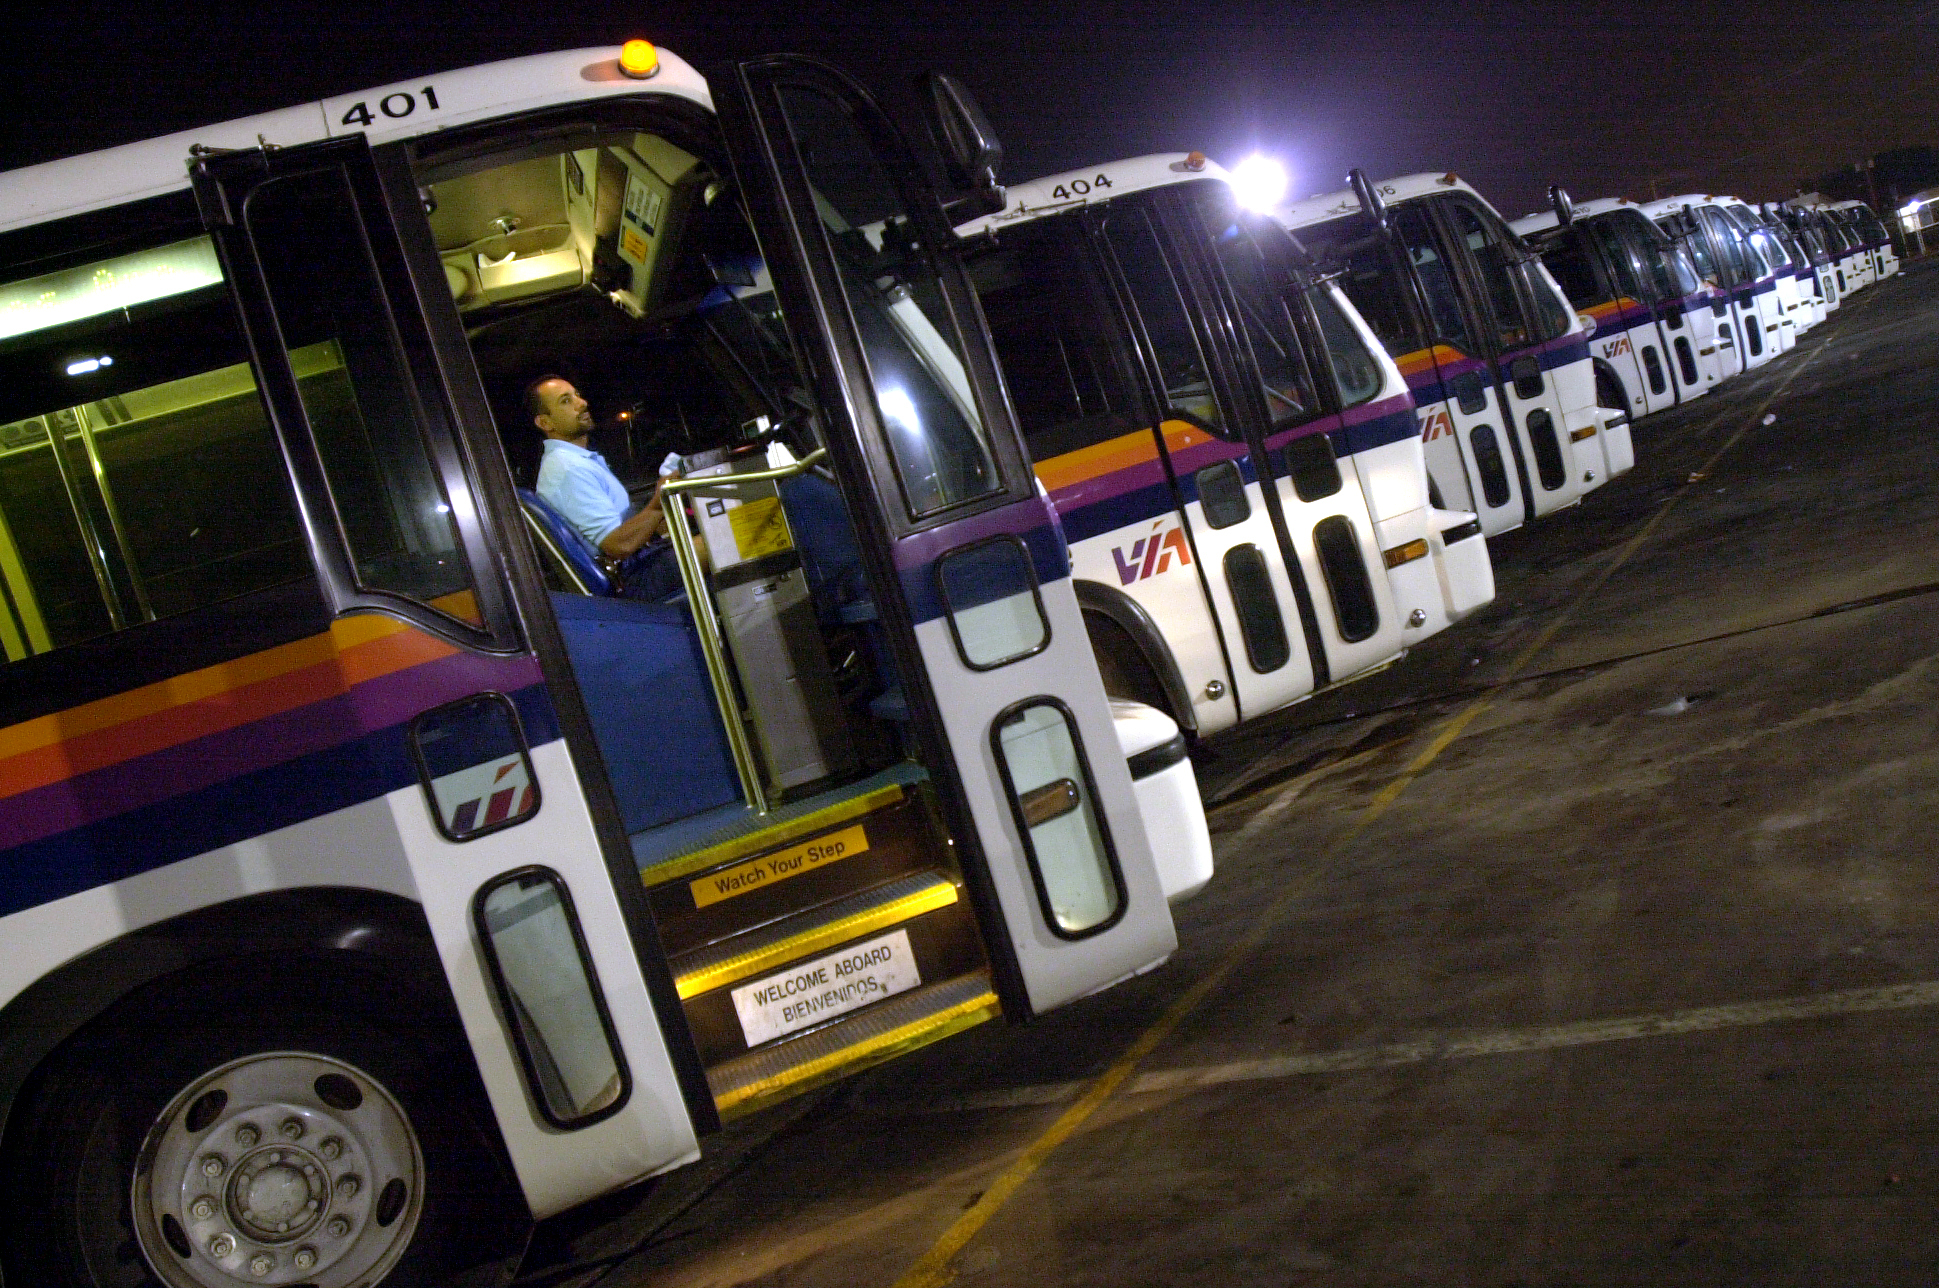 Via Offers Rides To Events San Antonio Express News